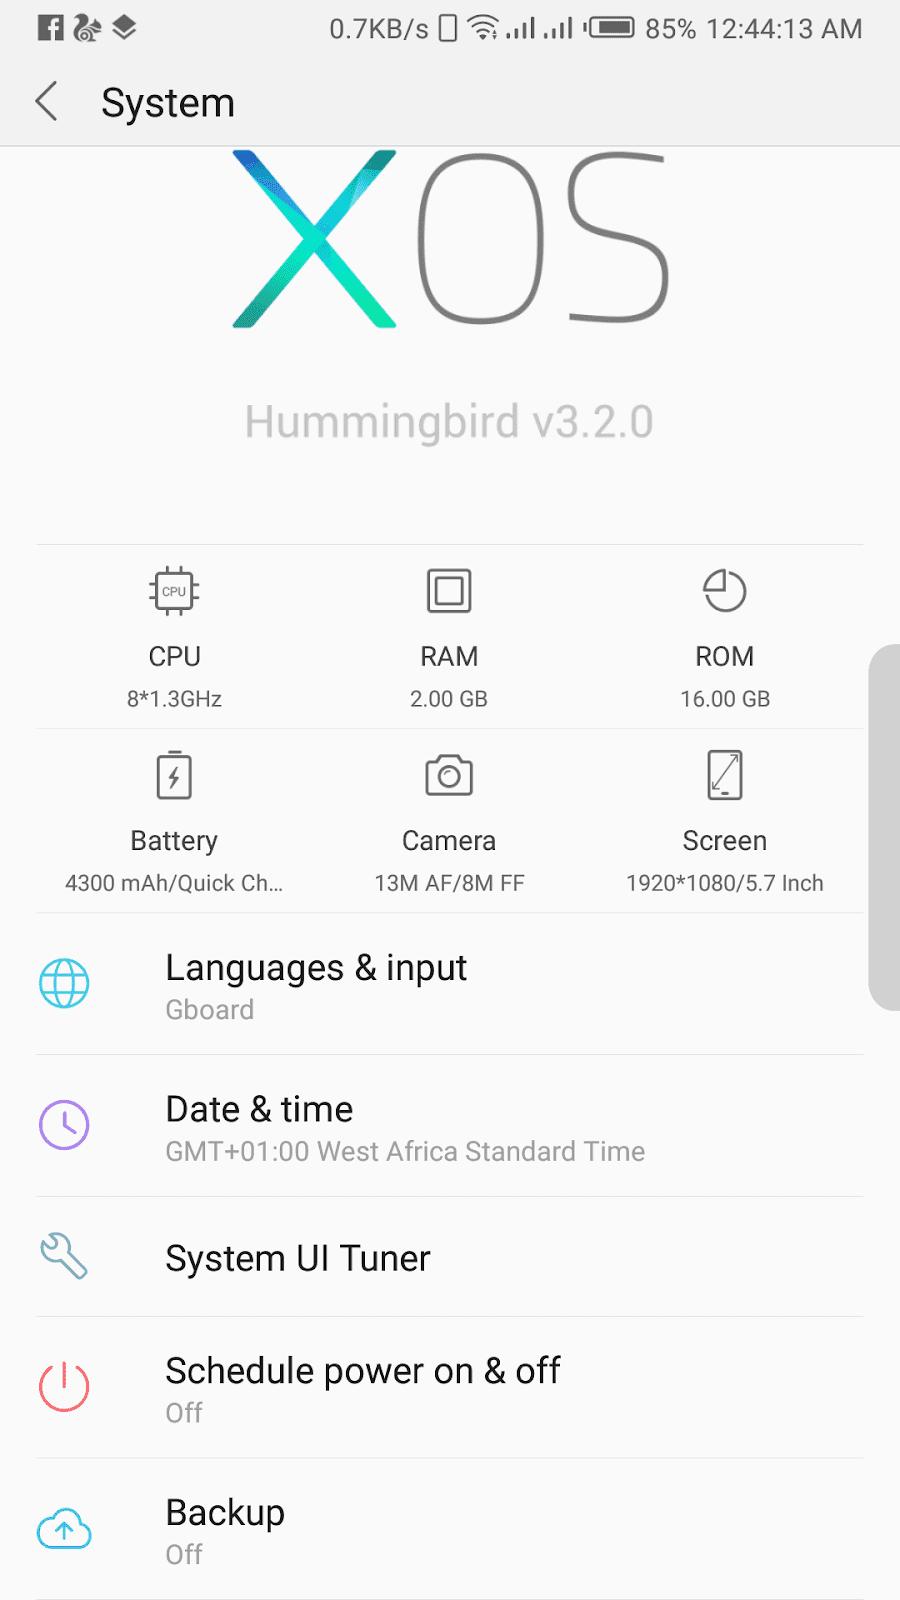 Infinix Note 4 X572 XOS 3.2 Hummingbird